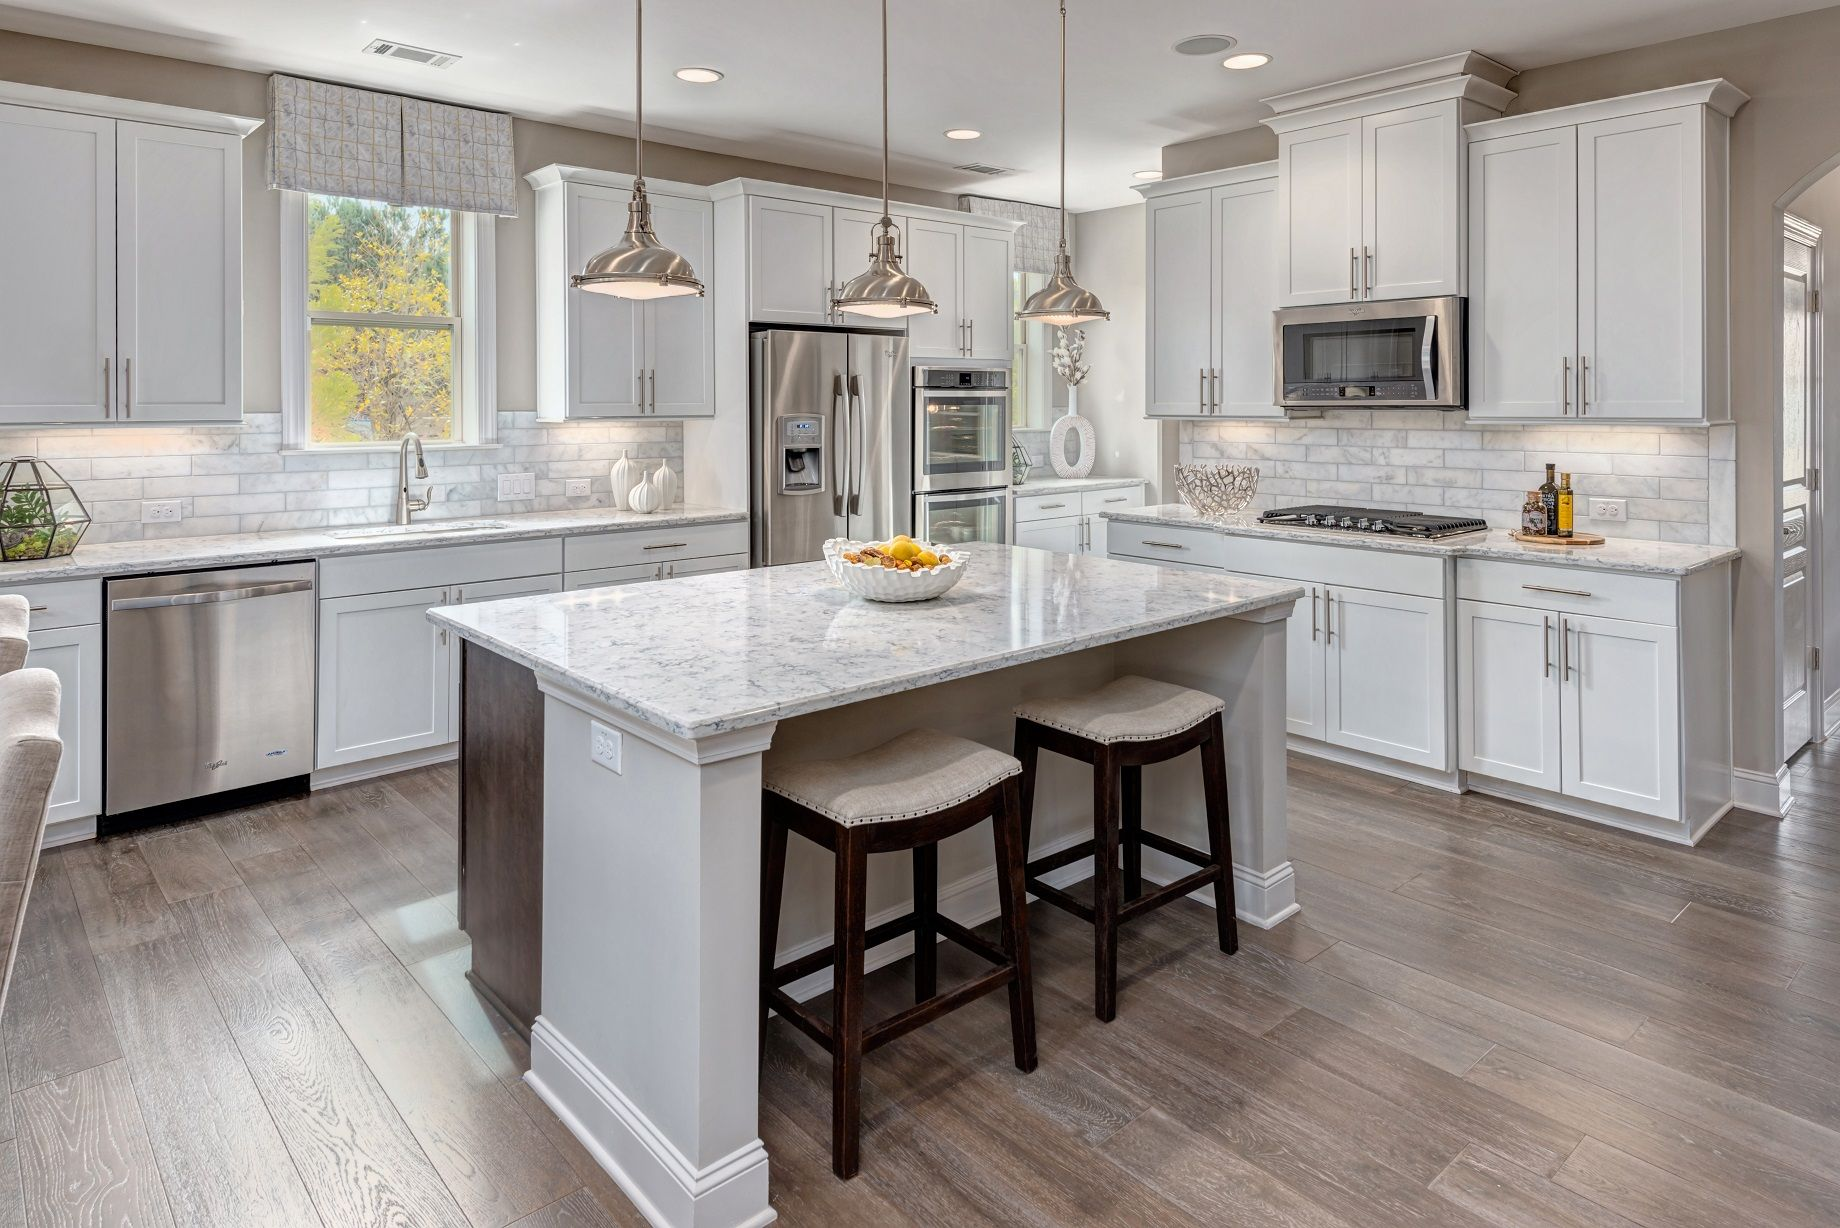 CalAtlantic Homes Featuring Fresnel Pendants By Progress Lighting · Space  KitchenNew KitchenKitchen WhitePalm DesertKitchen ...